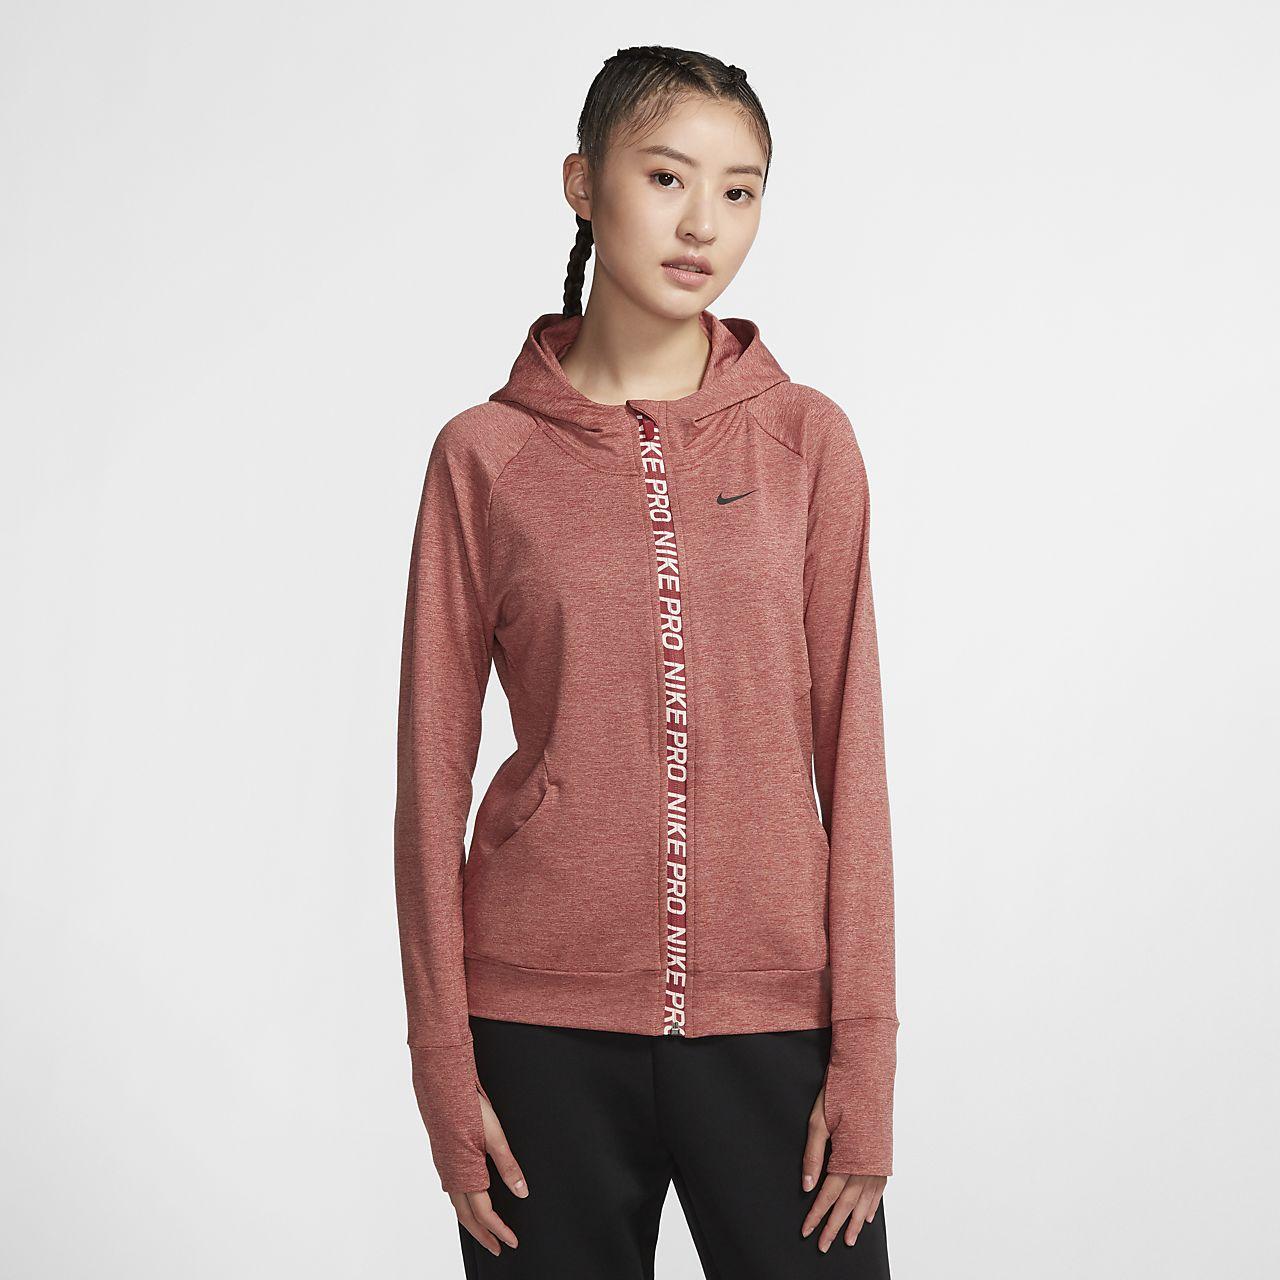 Nike Pro Warm 女子全长拉链开襟训练上衣